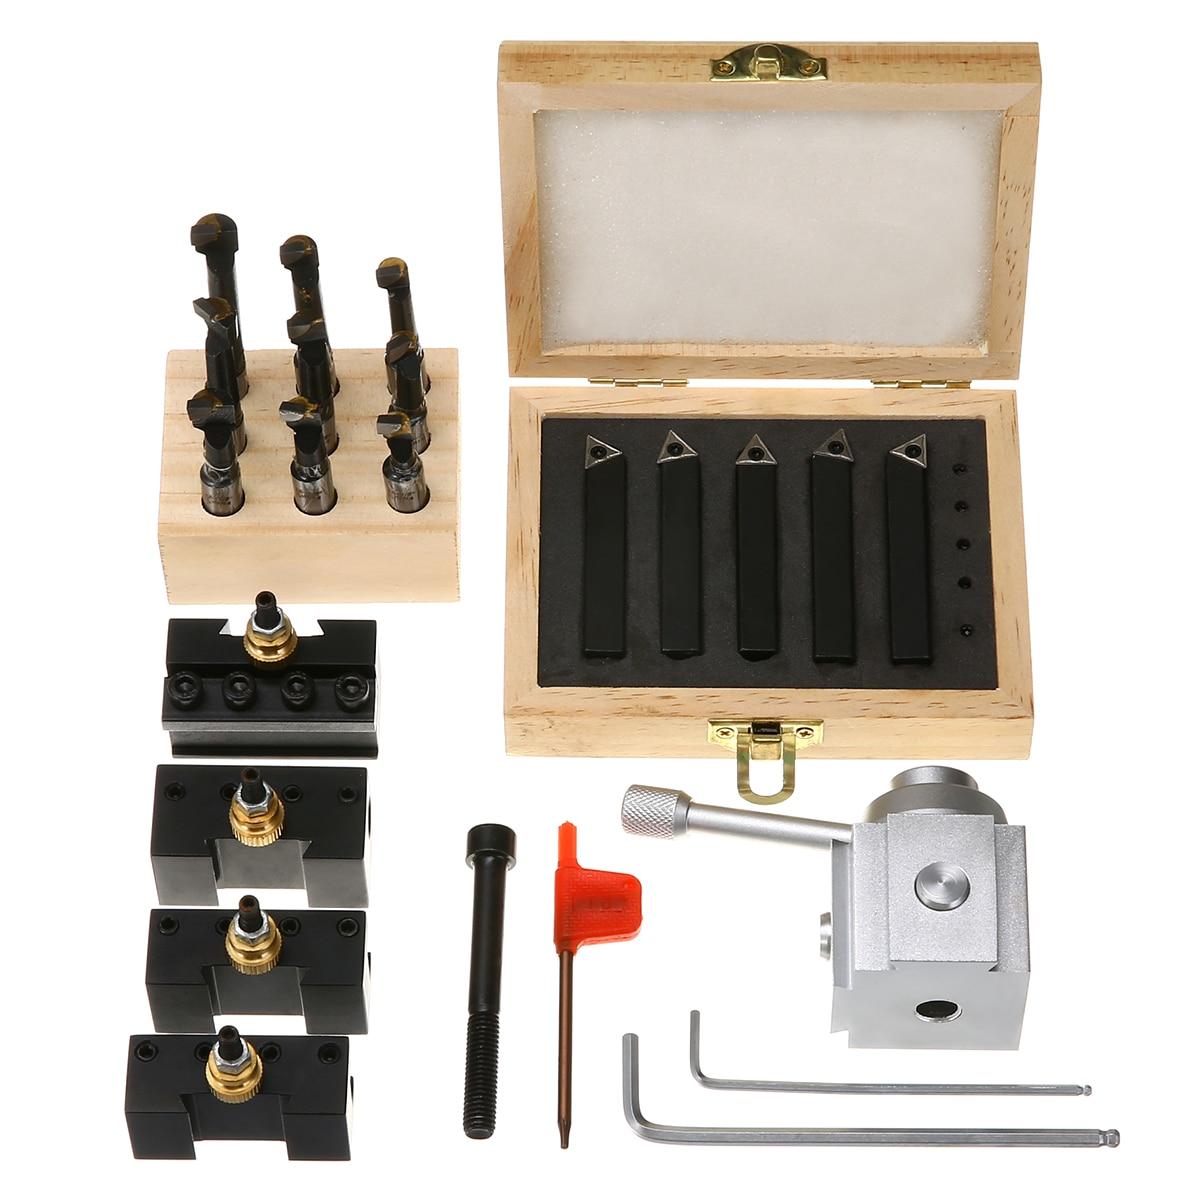 5pcs Quick Change Tool Post Holder + 9pcs 3/8 Boring Bar + 5pcs 3/8 Turning Tool 6061 T6 Aluminum 5pcs ir2153s ir2153 sop 8 ir2153strpbf